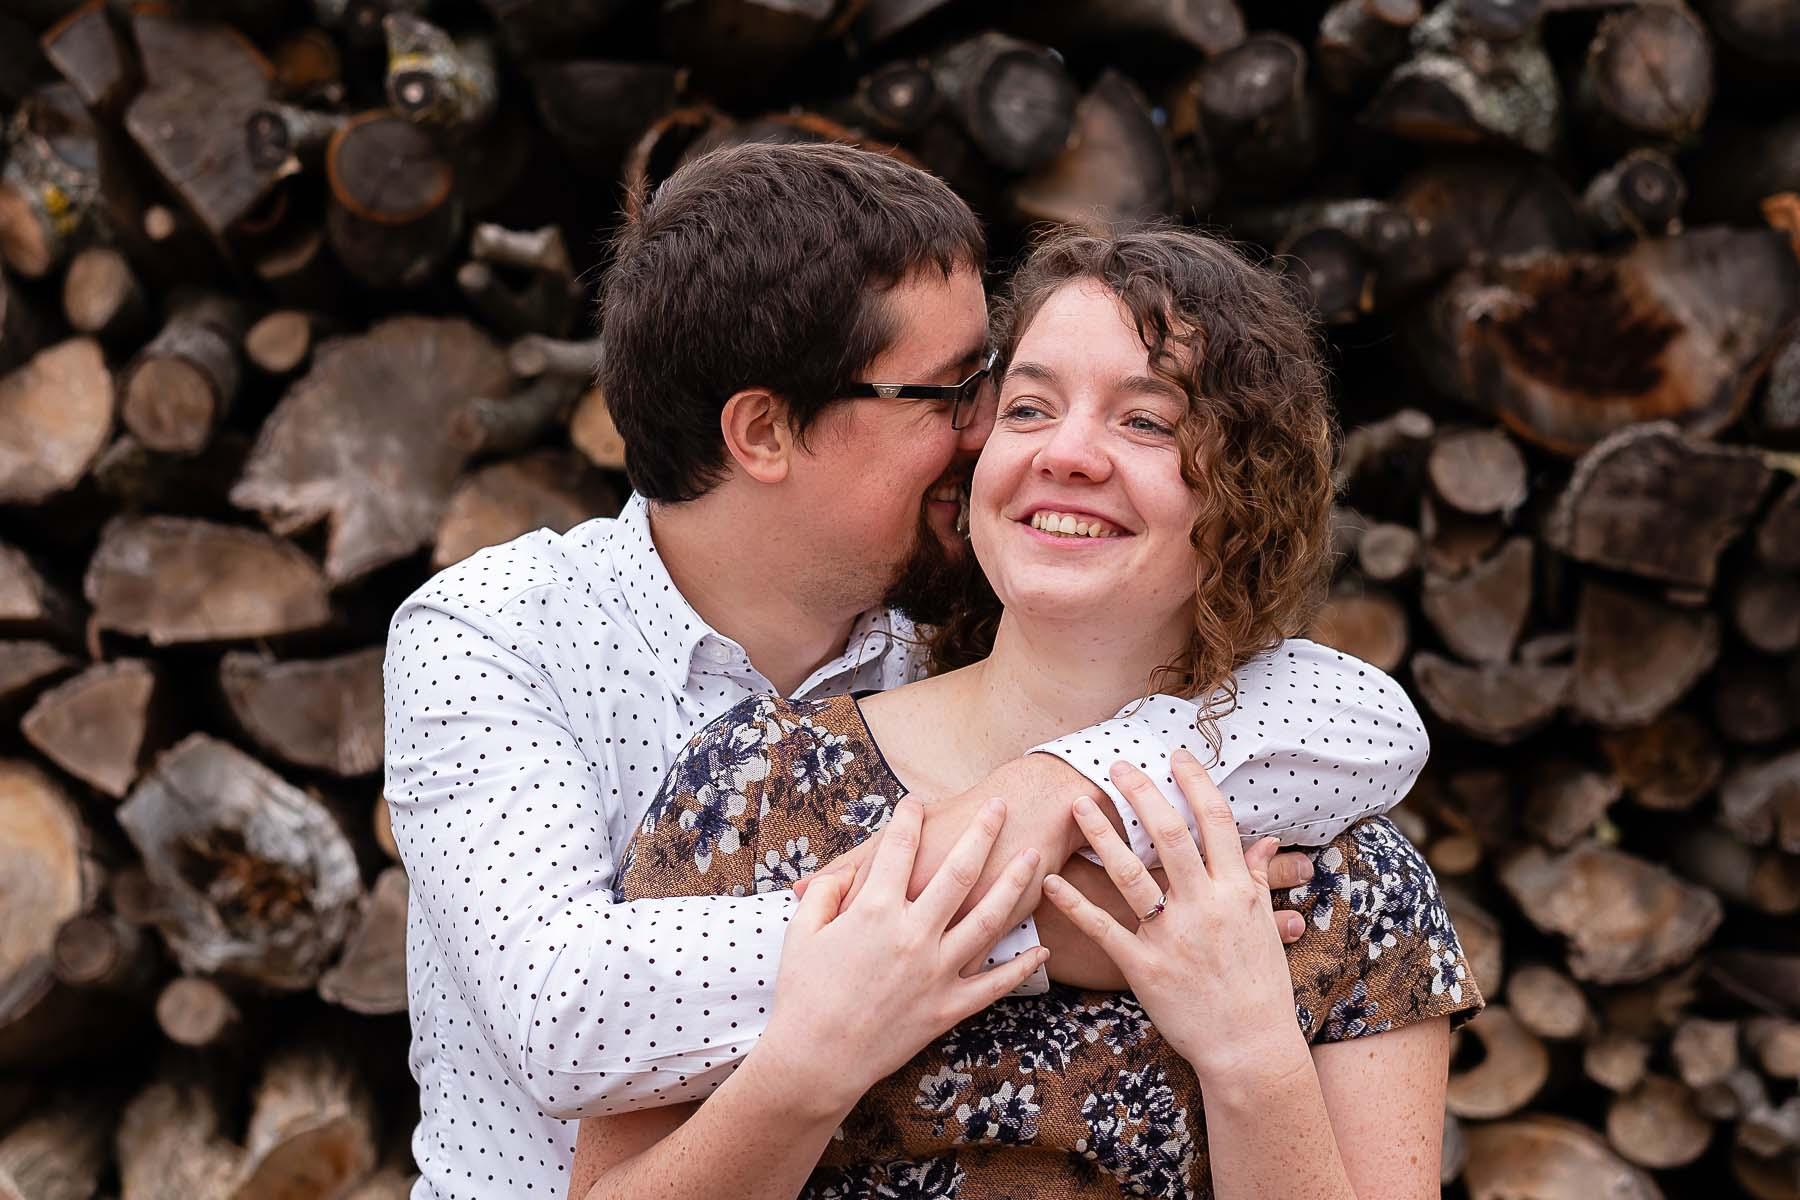 Steeve-Constanty-photographe-professionnel-mariage-couple-portrait-thann-cernay-mulhouse-colmar-guebwiller-soultz-alsace